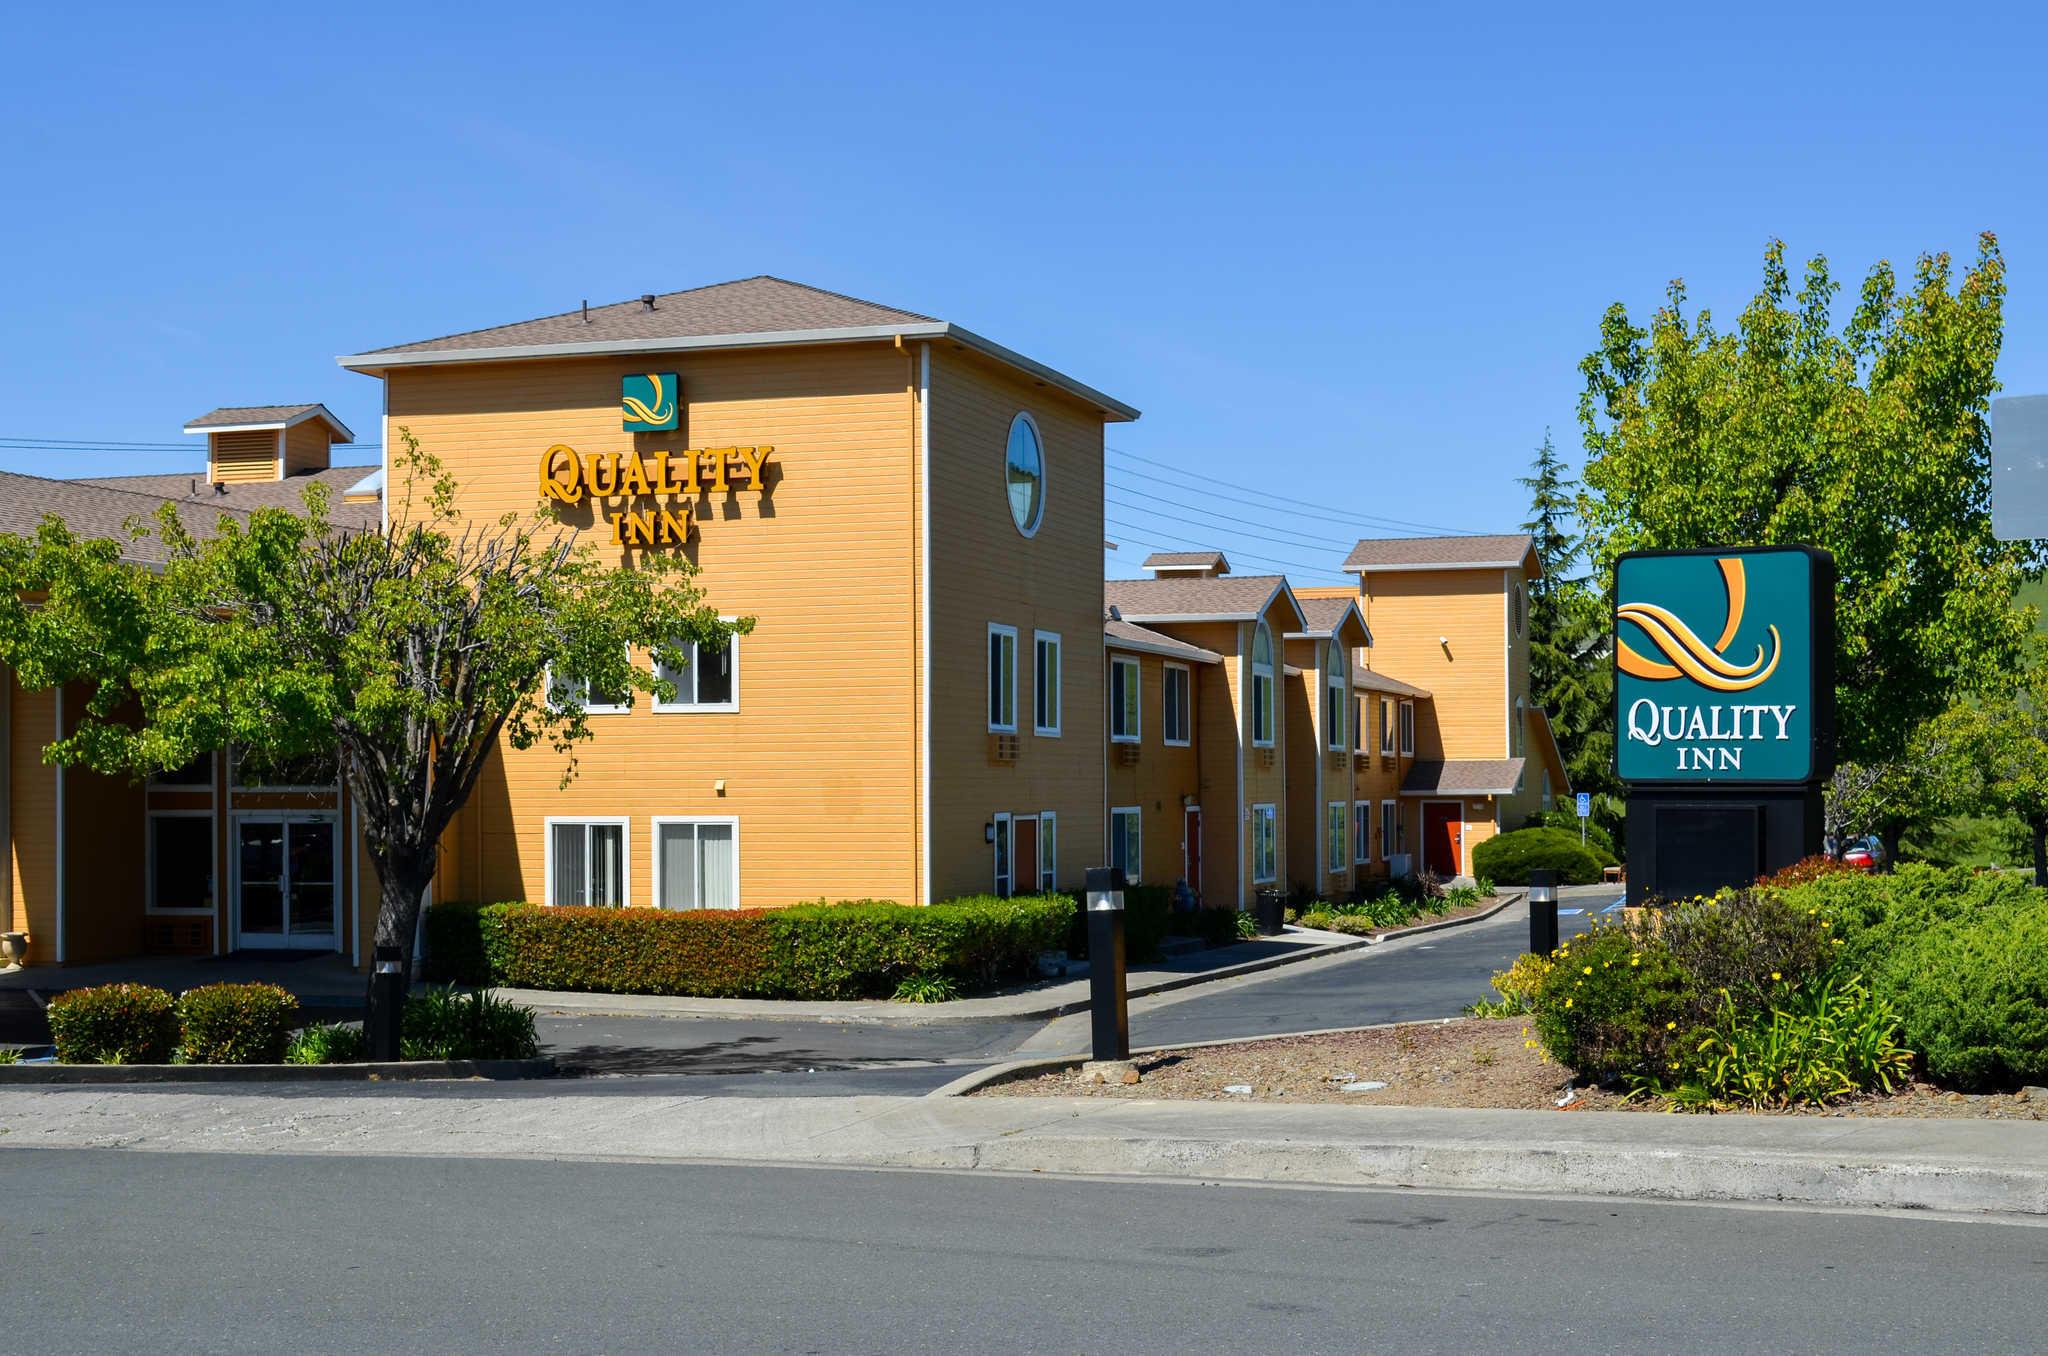 Casino vallejo california